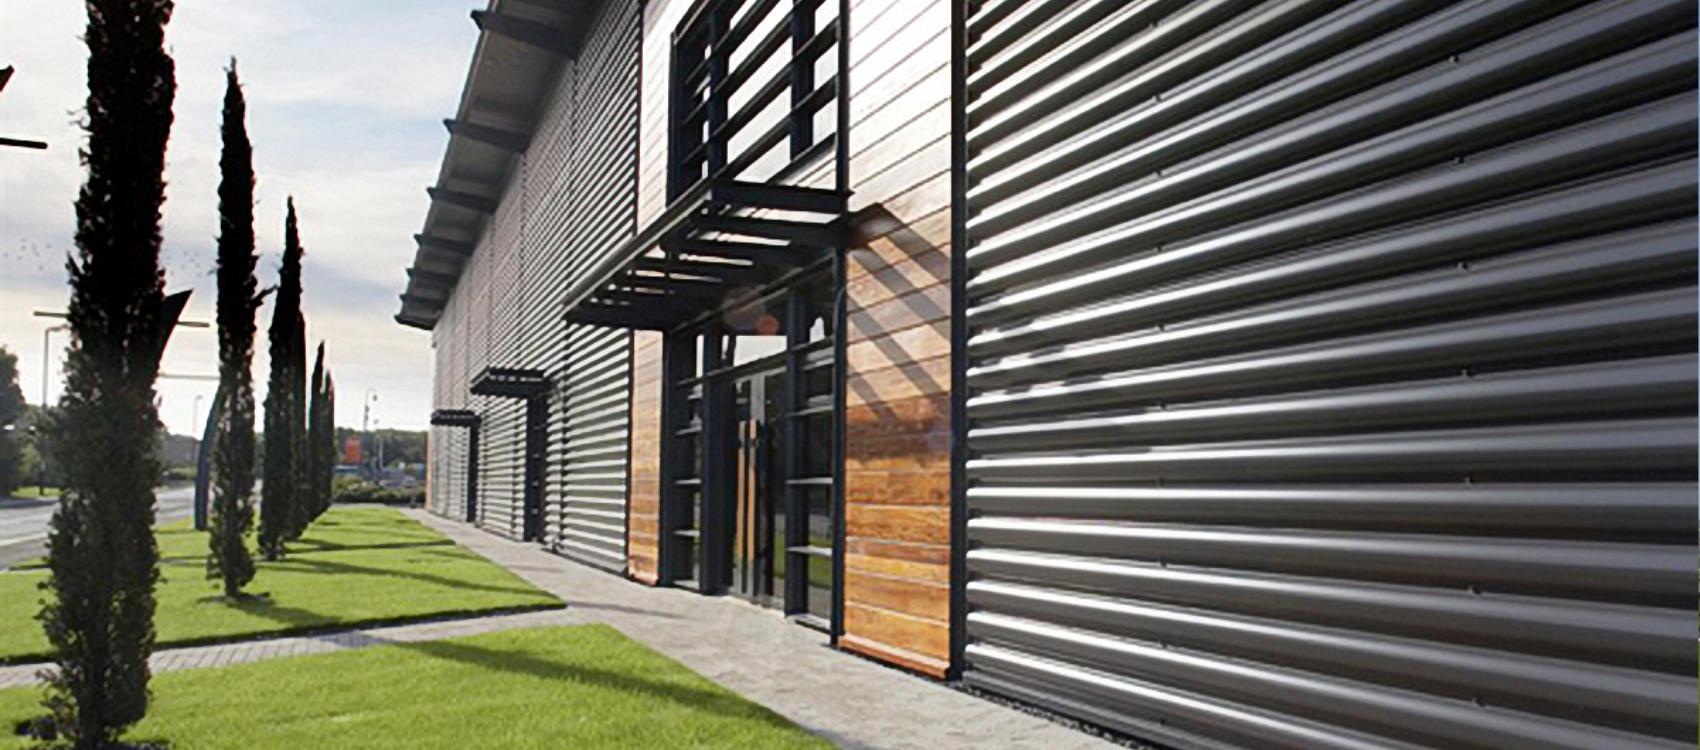 Architectural Profiles - Half Round/Sinusoidal profiles